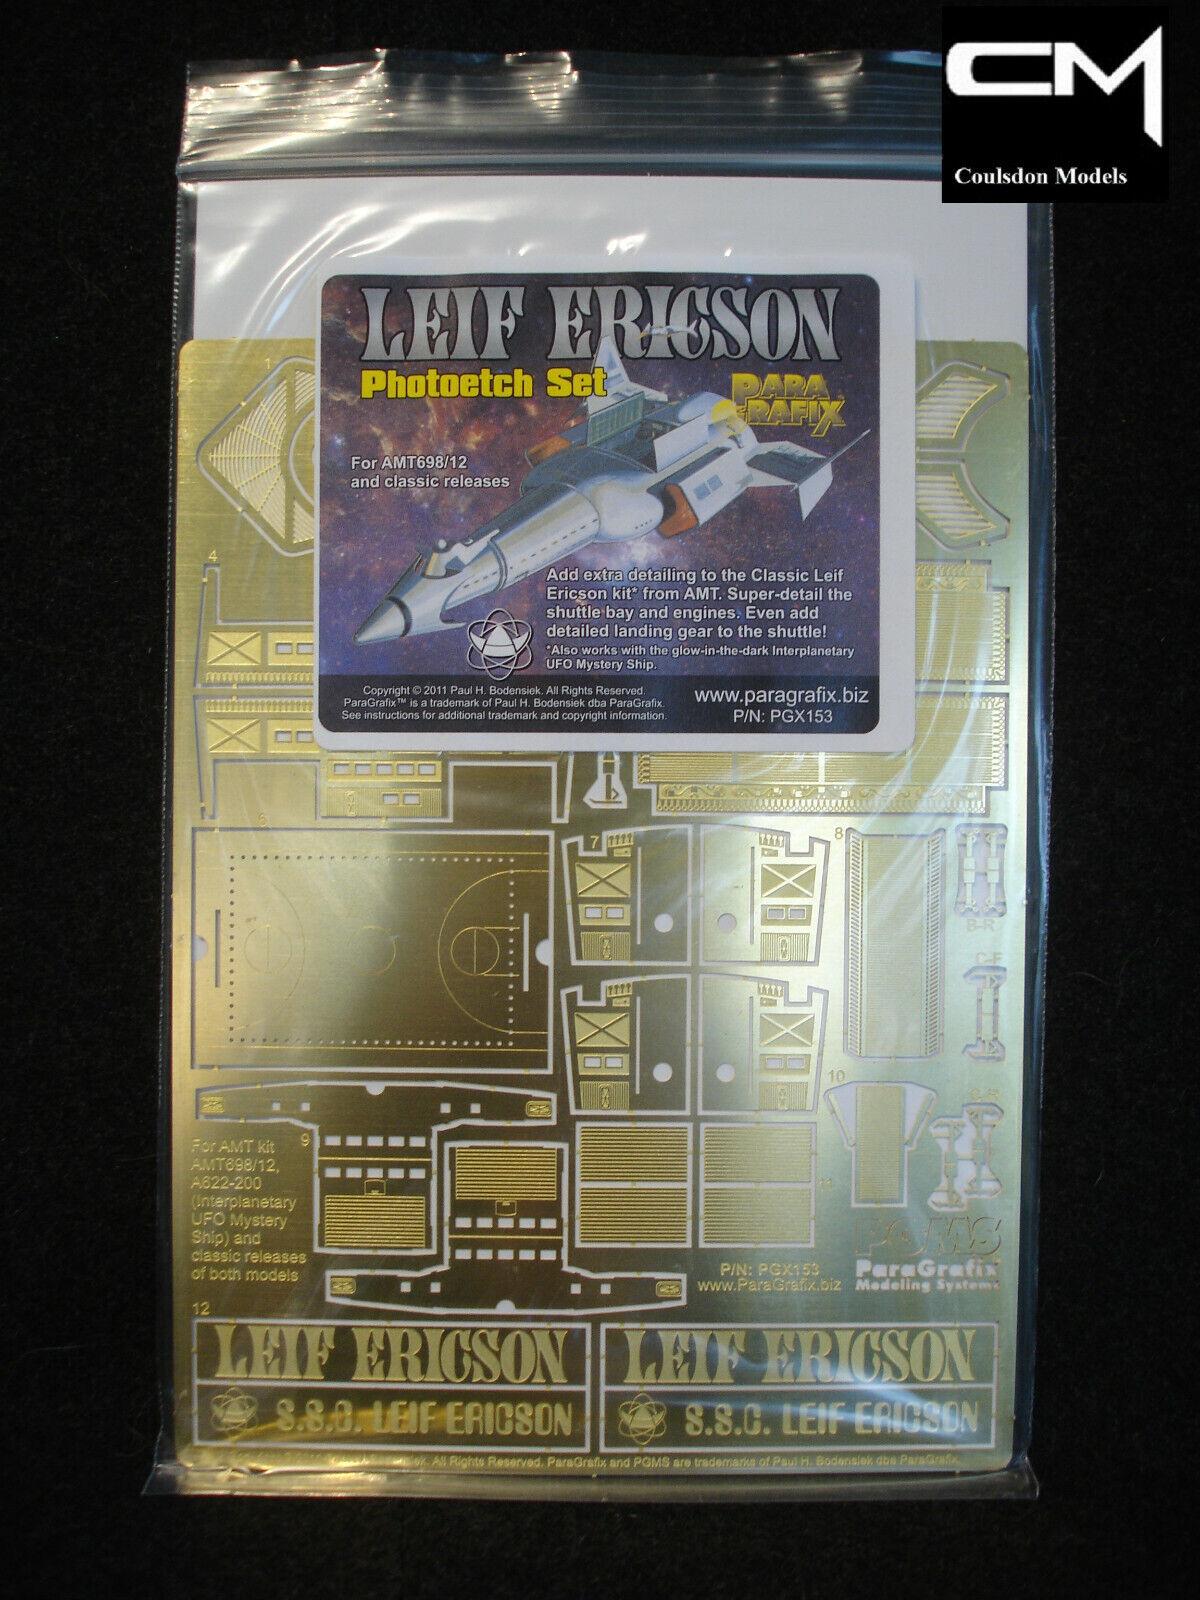 Paragrafix PGX153 Leif Ericson Photoetch Set Fot AMT698 12 & Classic Kits